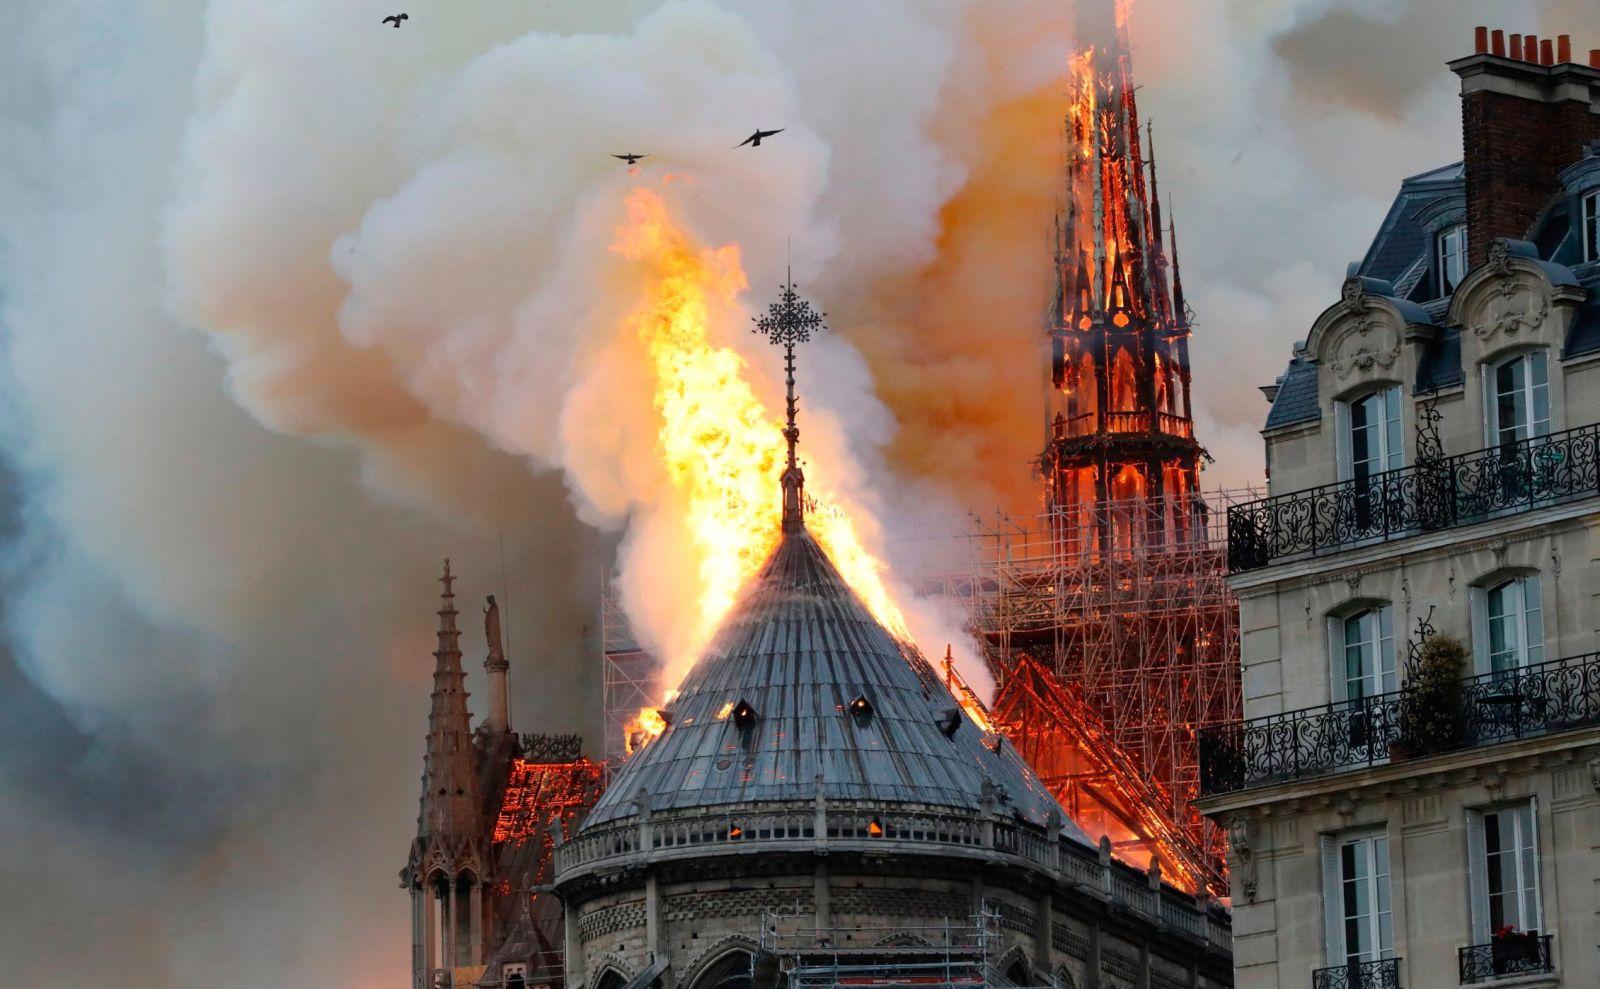 notredam katedral yangını https://huglero.com